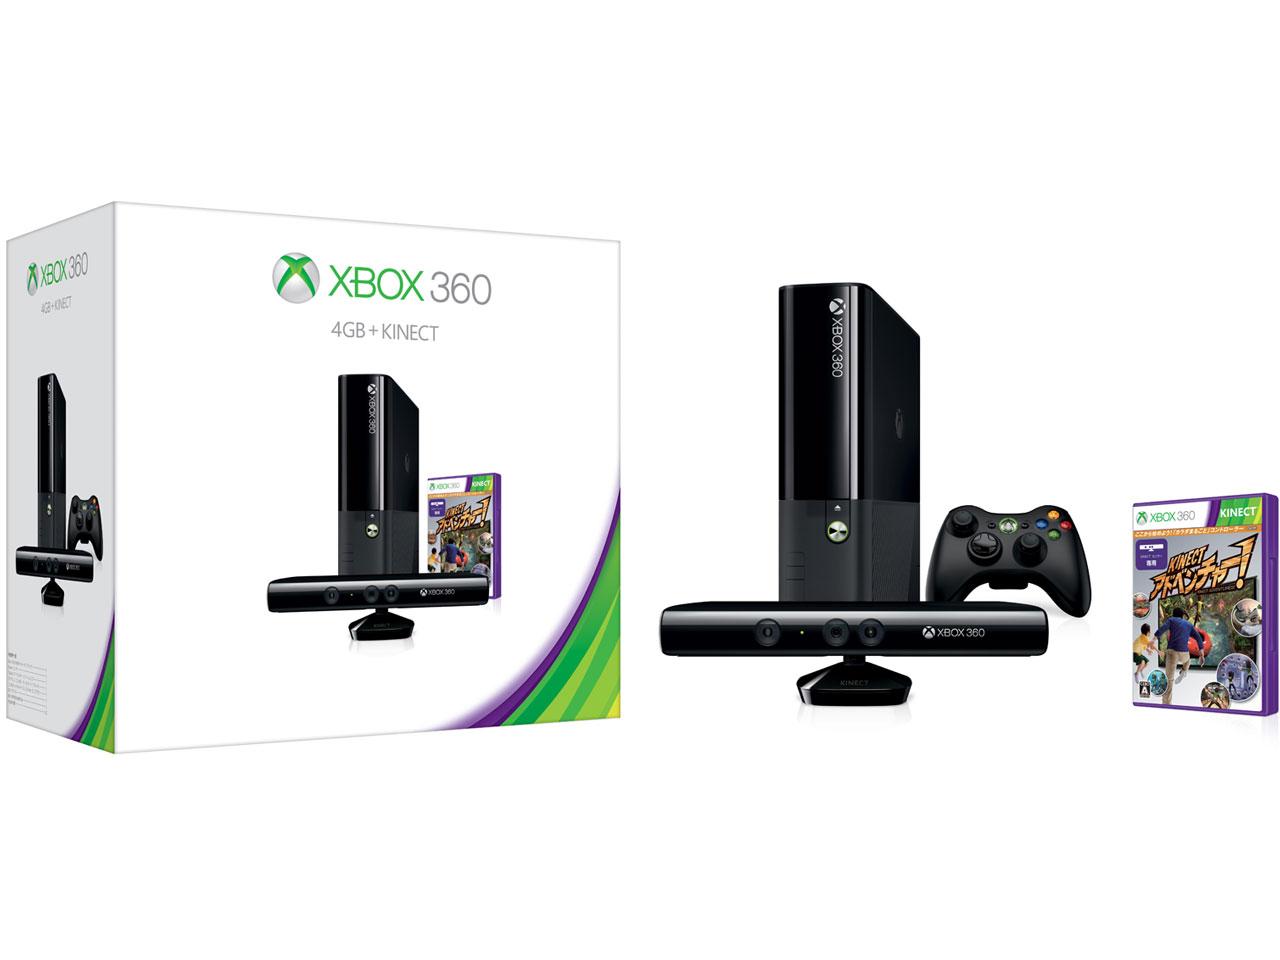 Xbox 360 4GB + Kinect [2013/09/19]